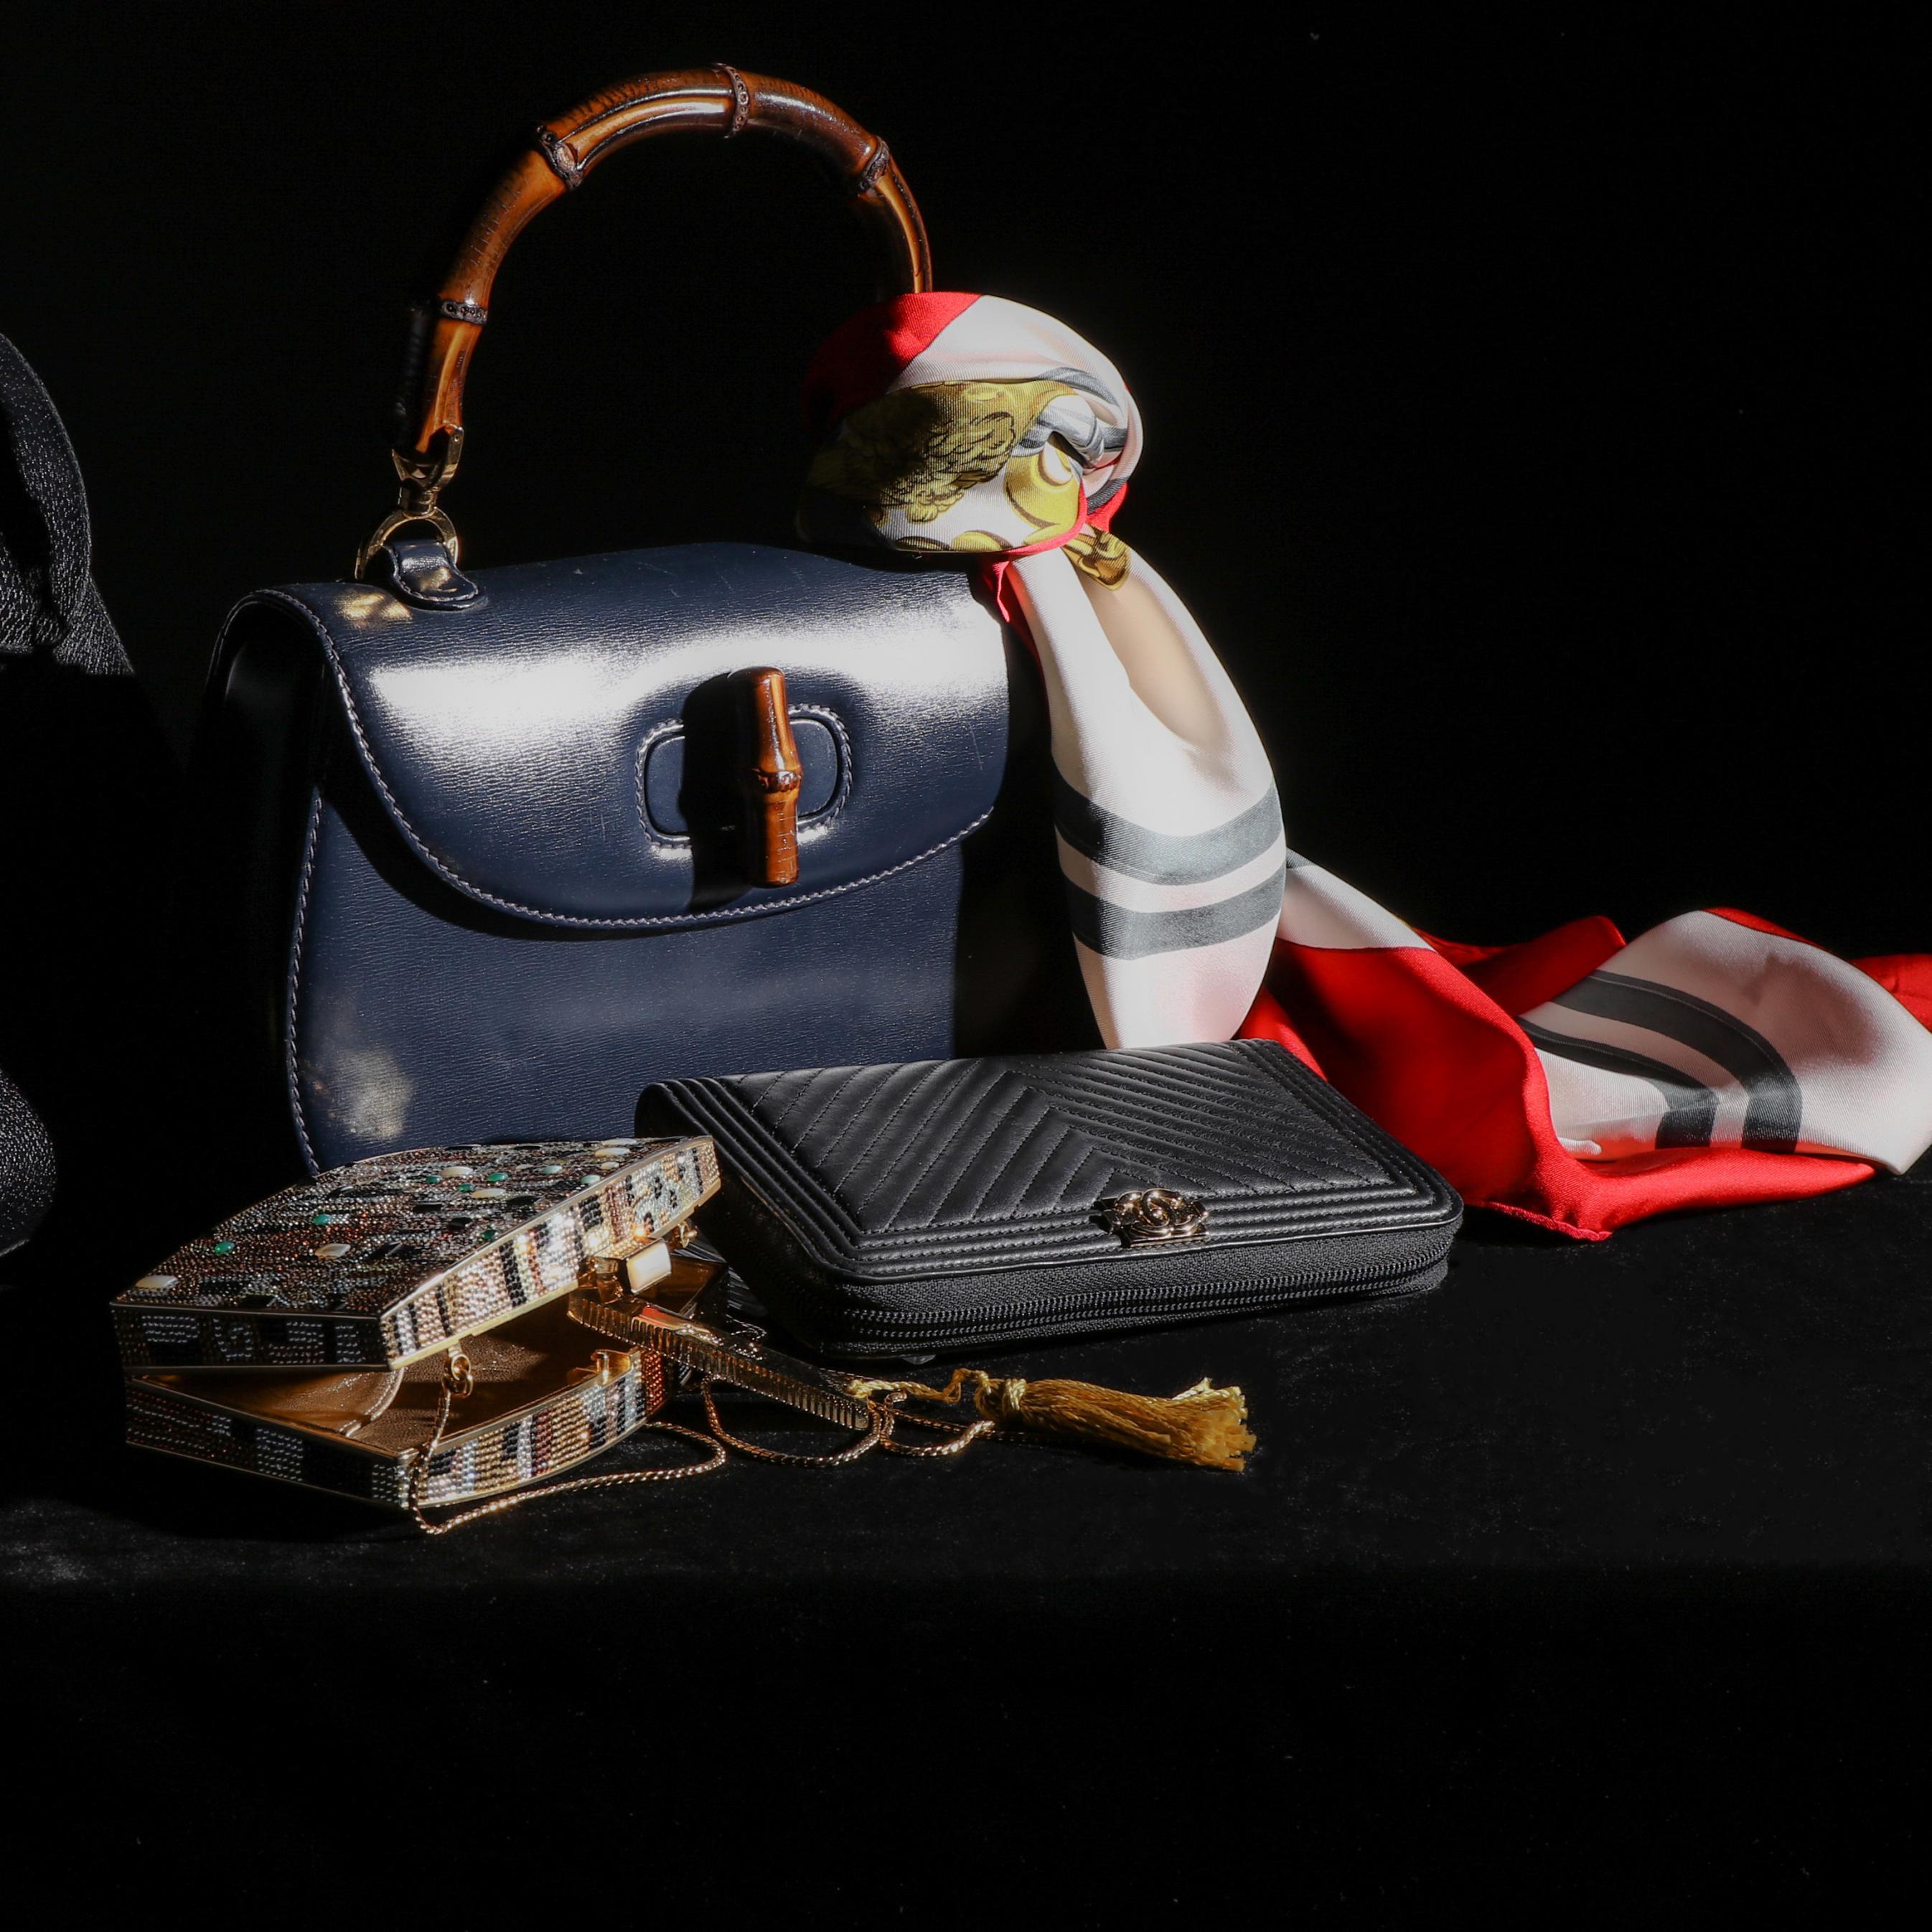 Luxury Accessories